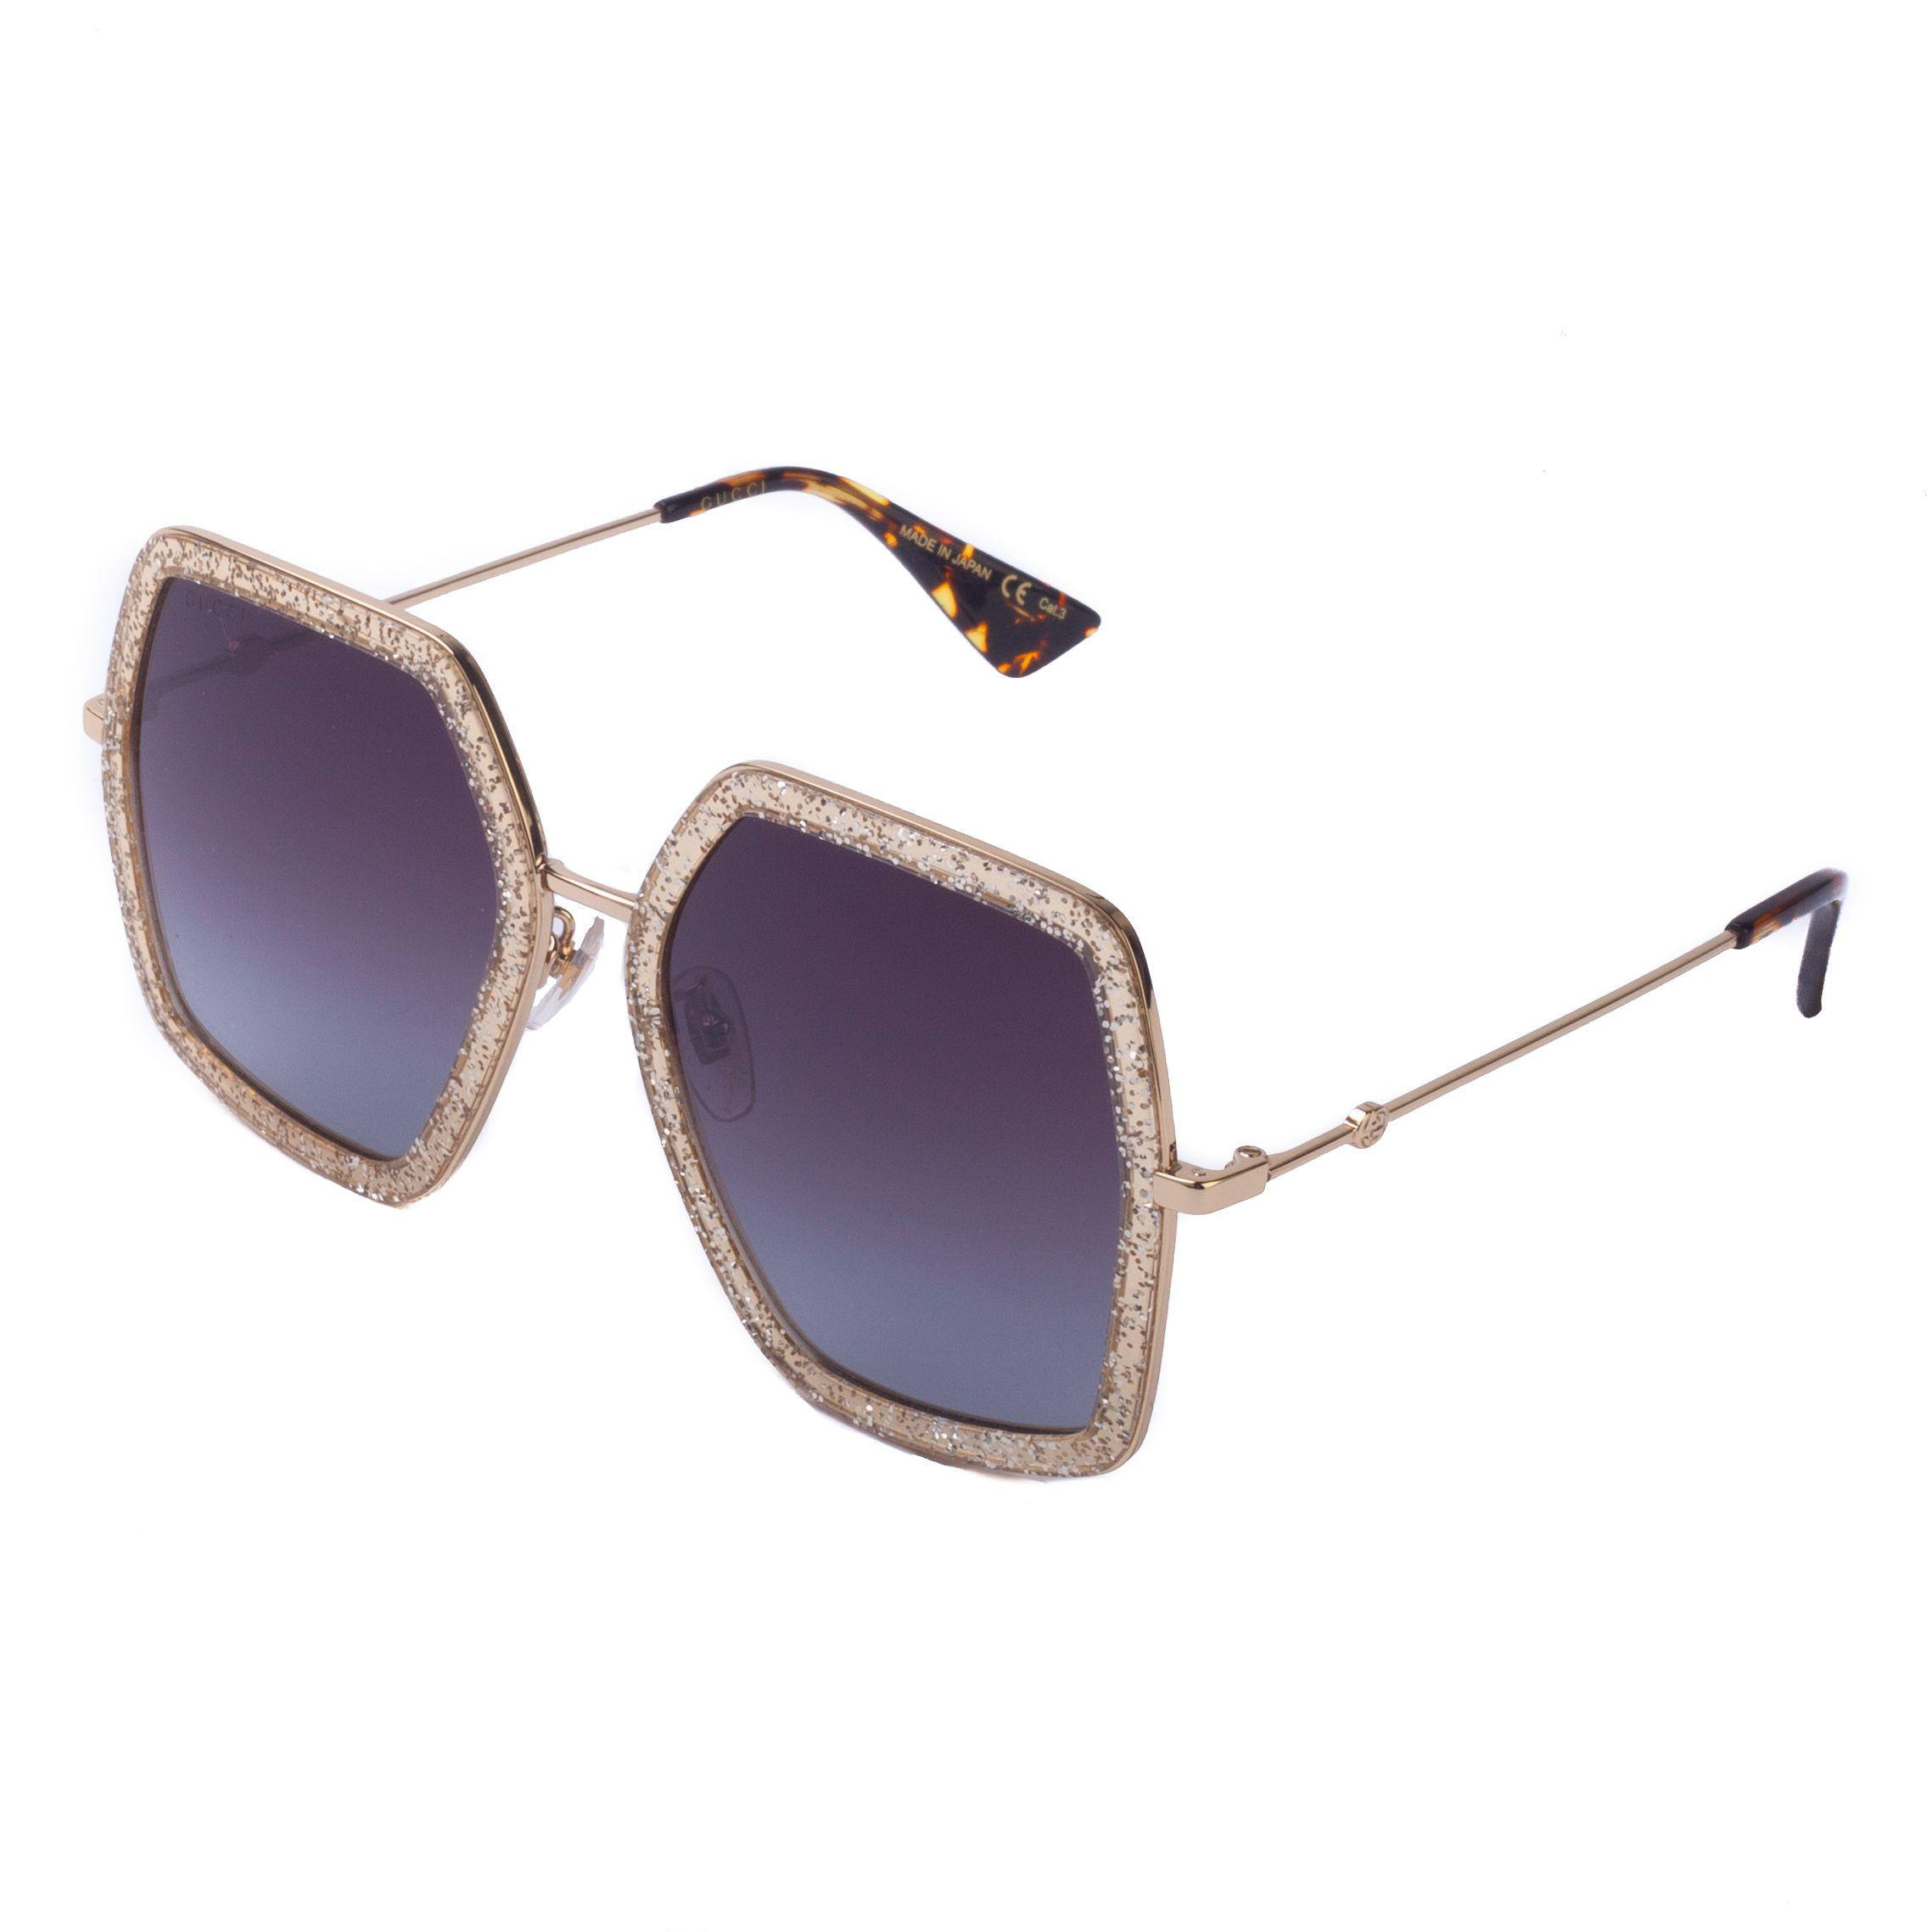 99755d342ad6e Lyst - Gucci Women s Butterfly Gold Glitter Sunglasses Gold in Metallic